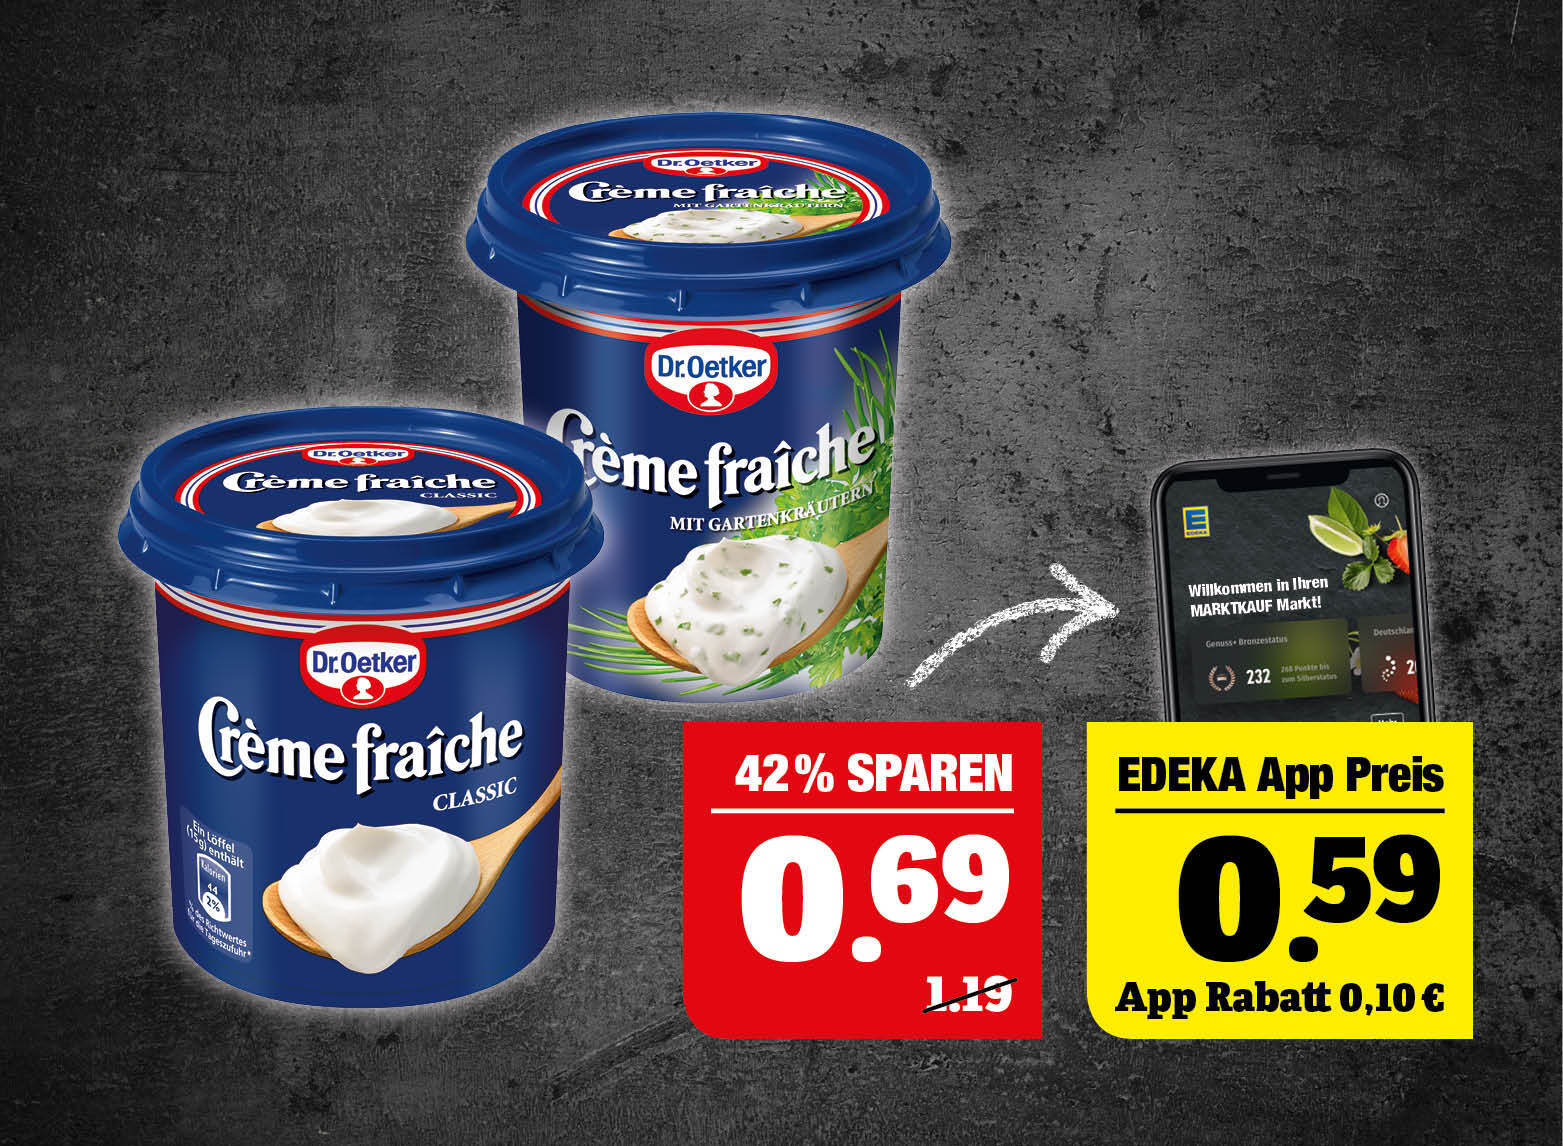 Dr. Oetker Crème fraîche - verschiedene Sorten, 125/150g Becher, 100g=0,55/0,46.